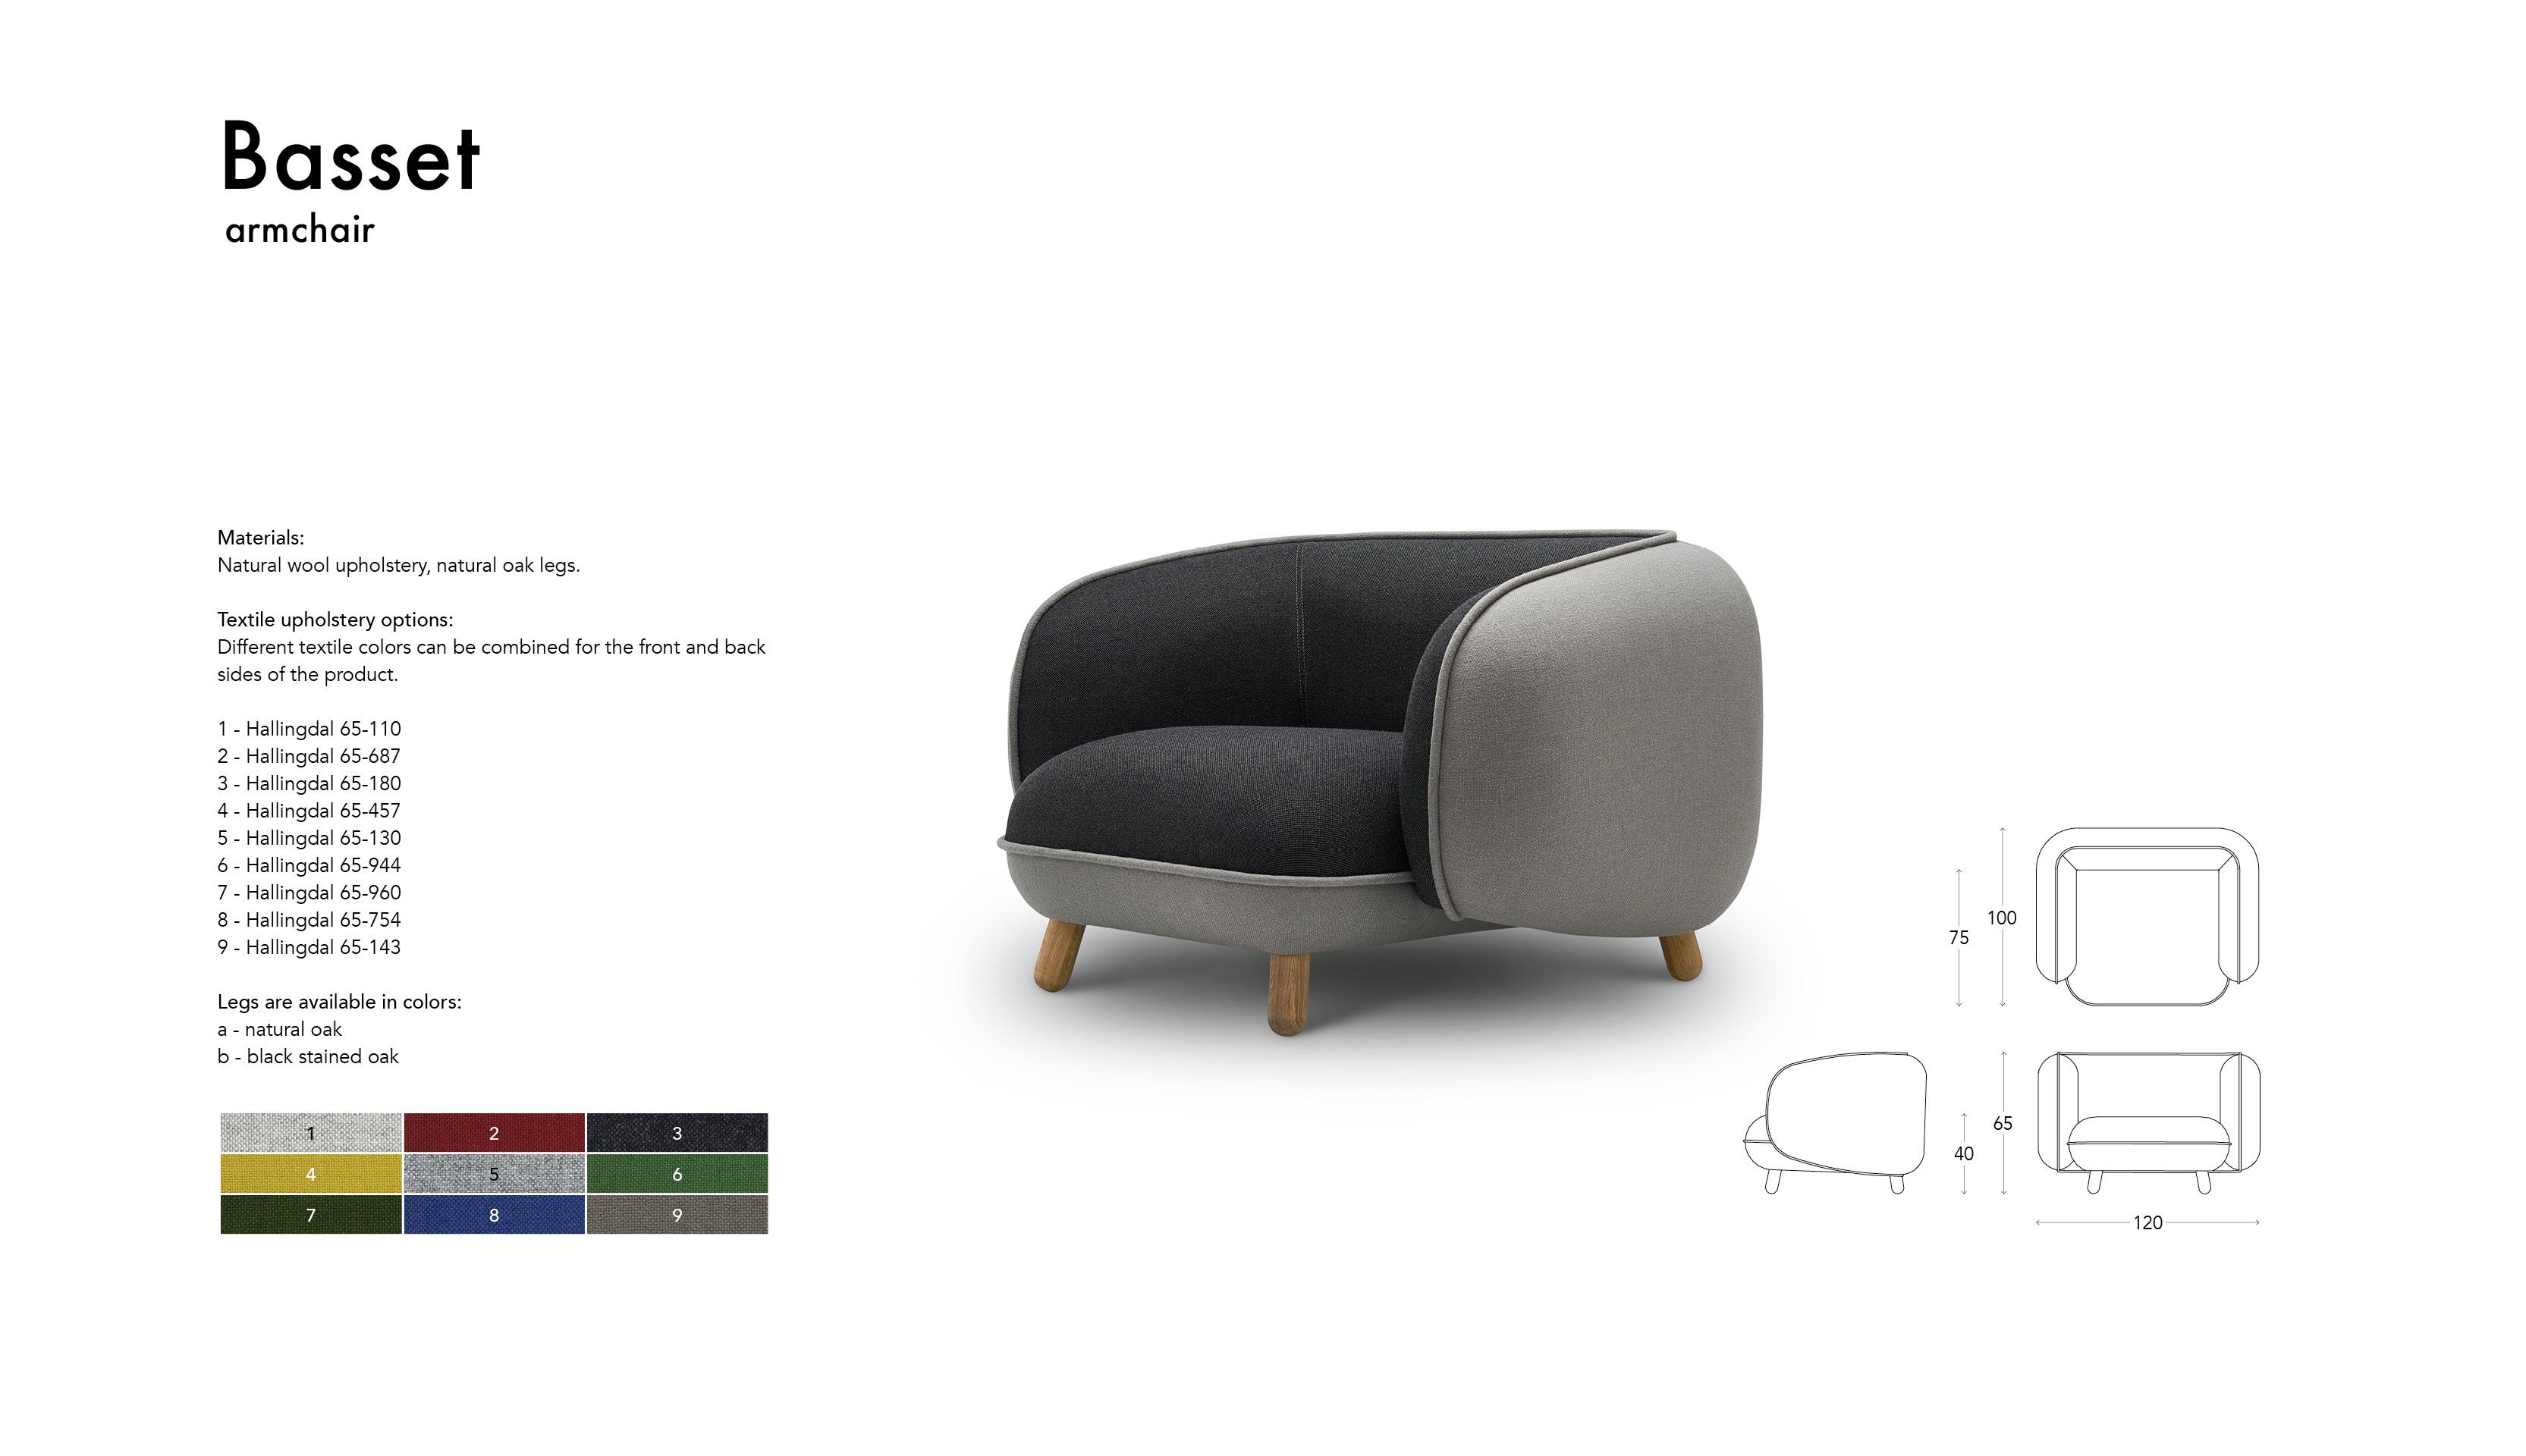 Basset armchair 1